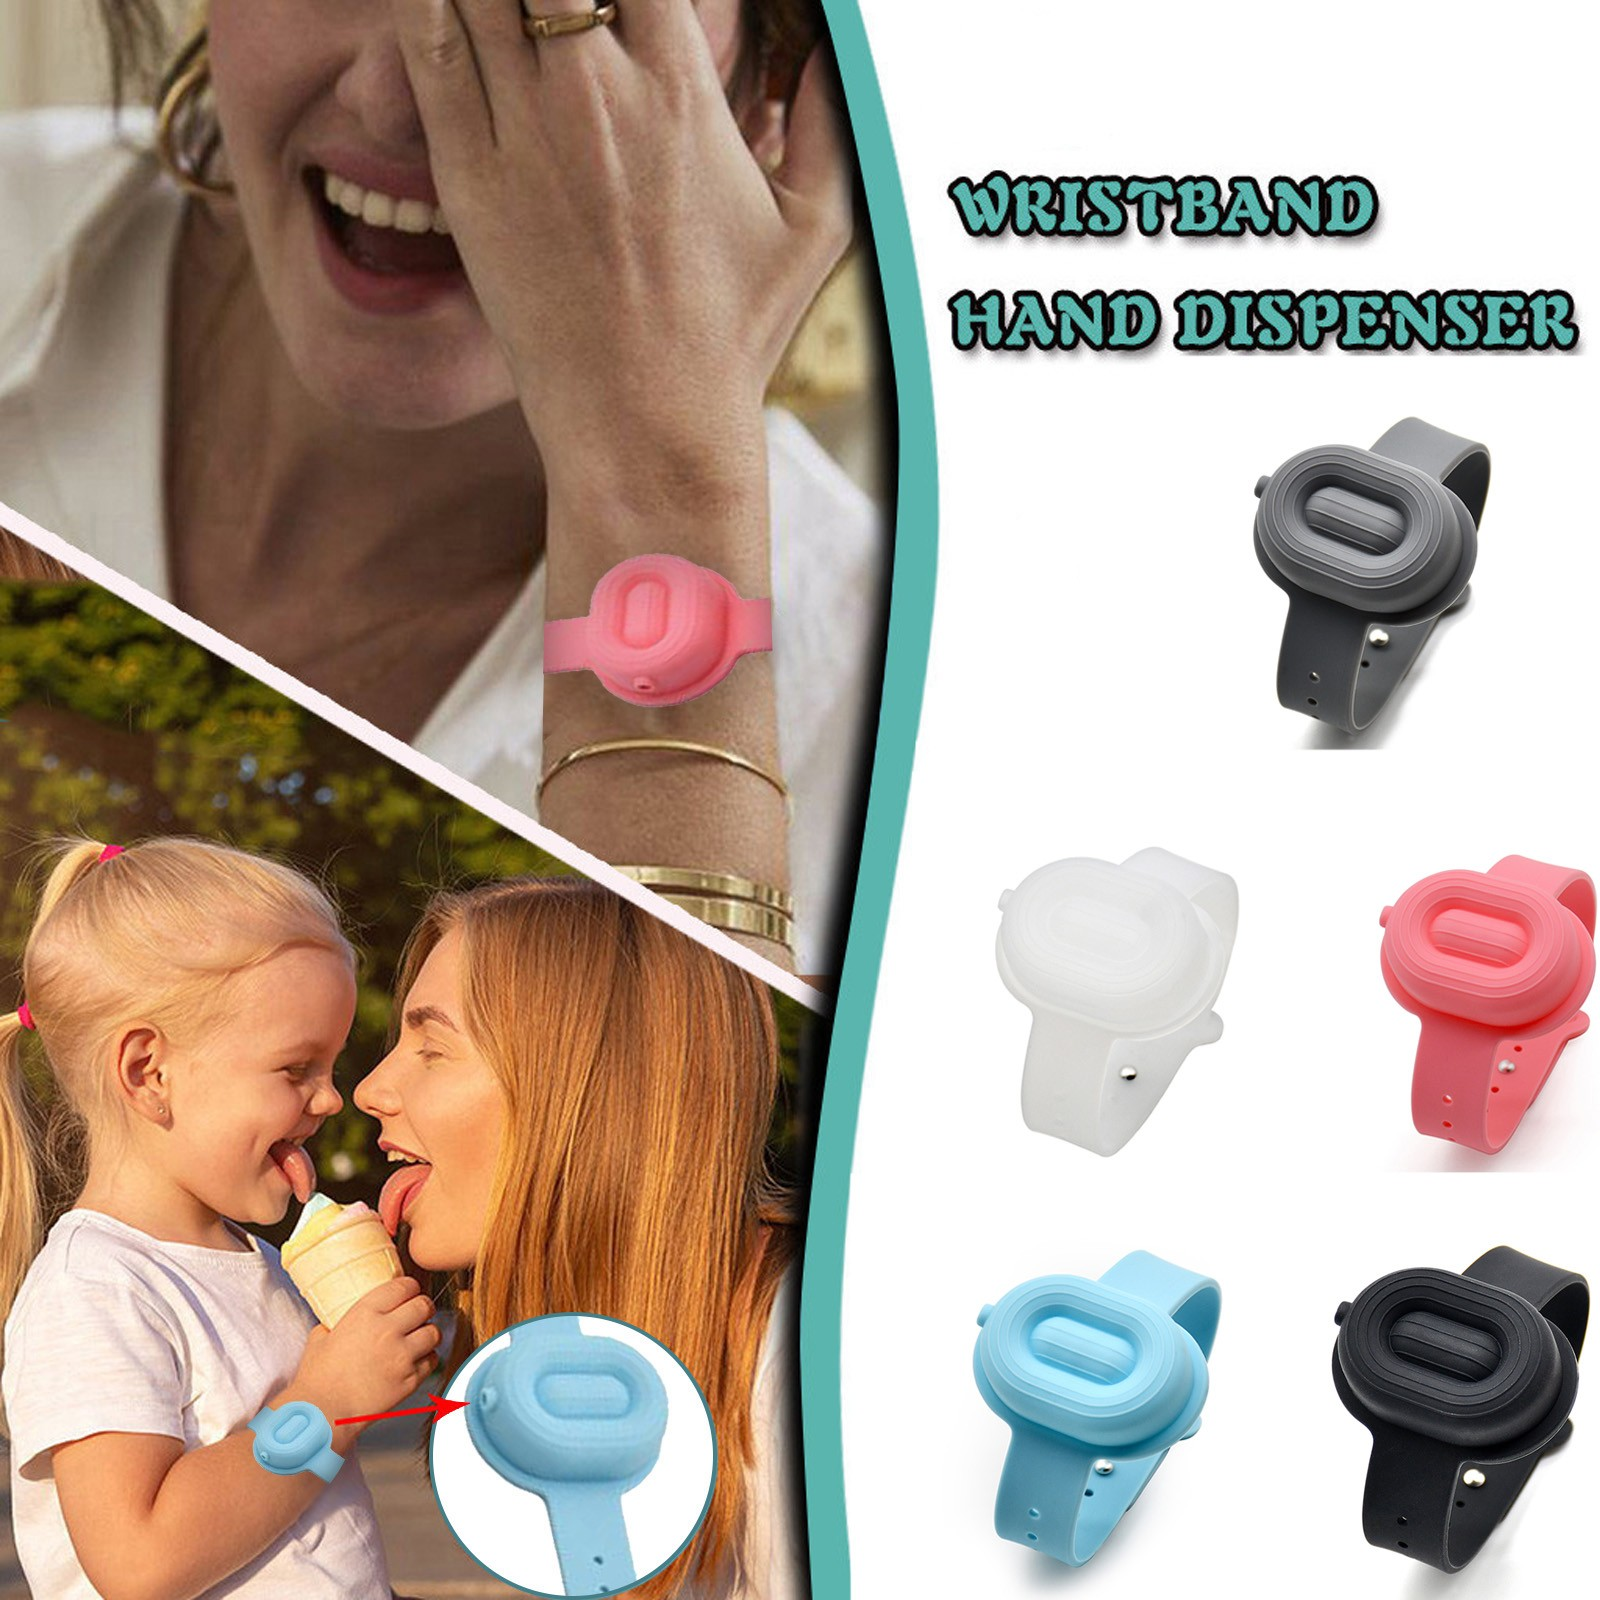 hand sanitizer dispensing silicone bracelet Adult child liquid wristband hand dispenser hand washing pulsera de bombas de mano